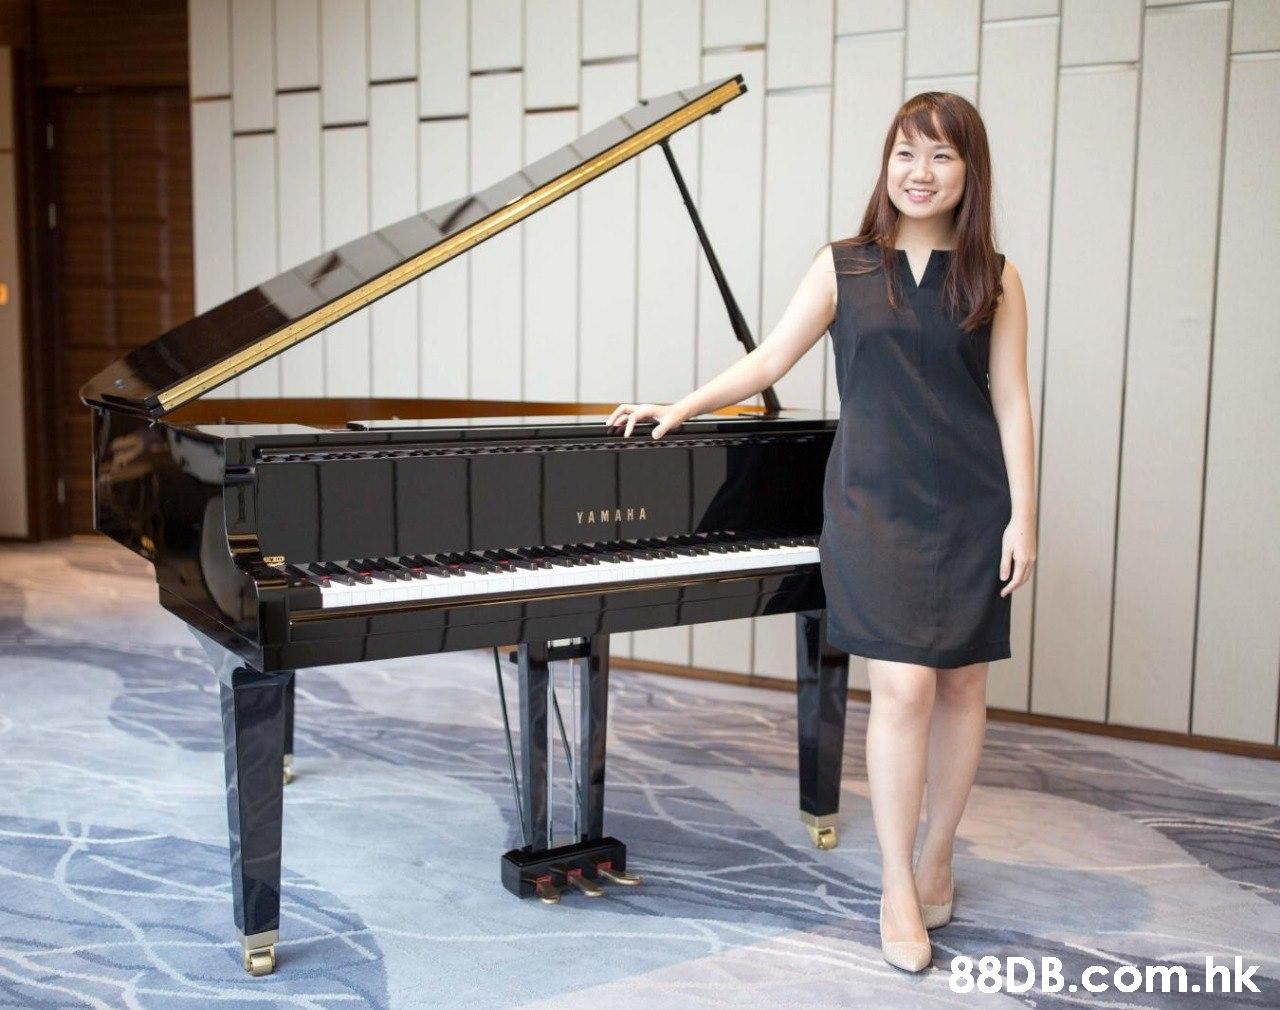 YA MAHA 8DB.com.hk  Fortepiano,Recital,Musical instrument,Piano,Pianist